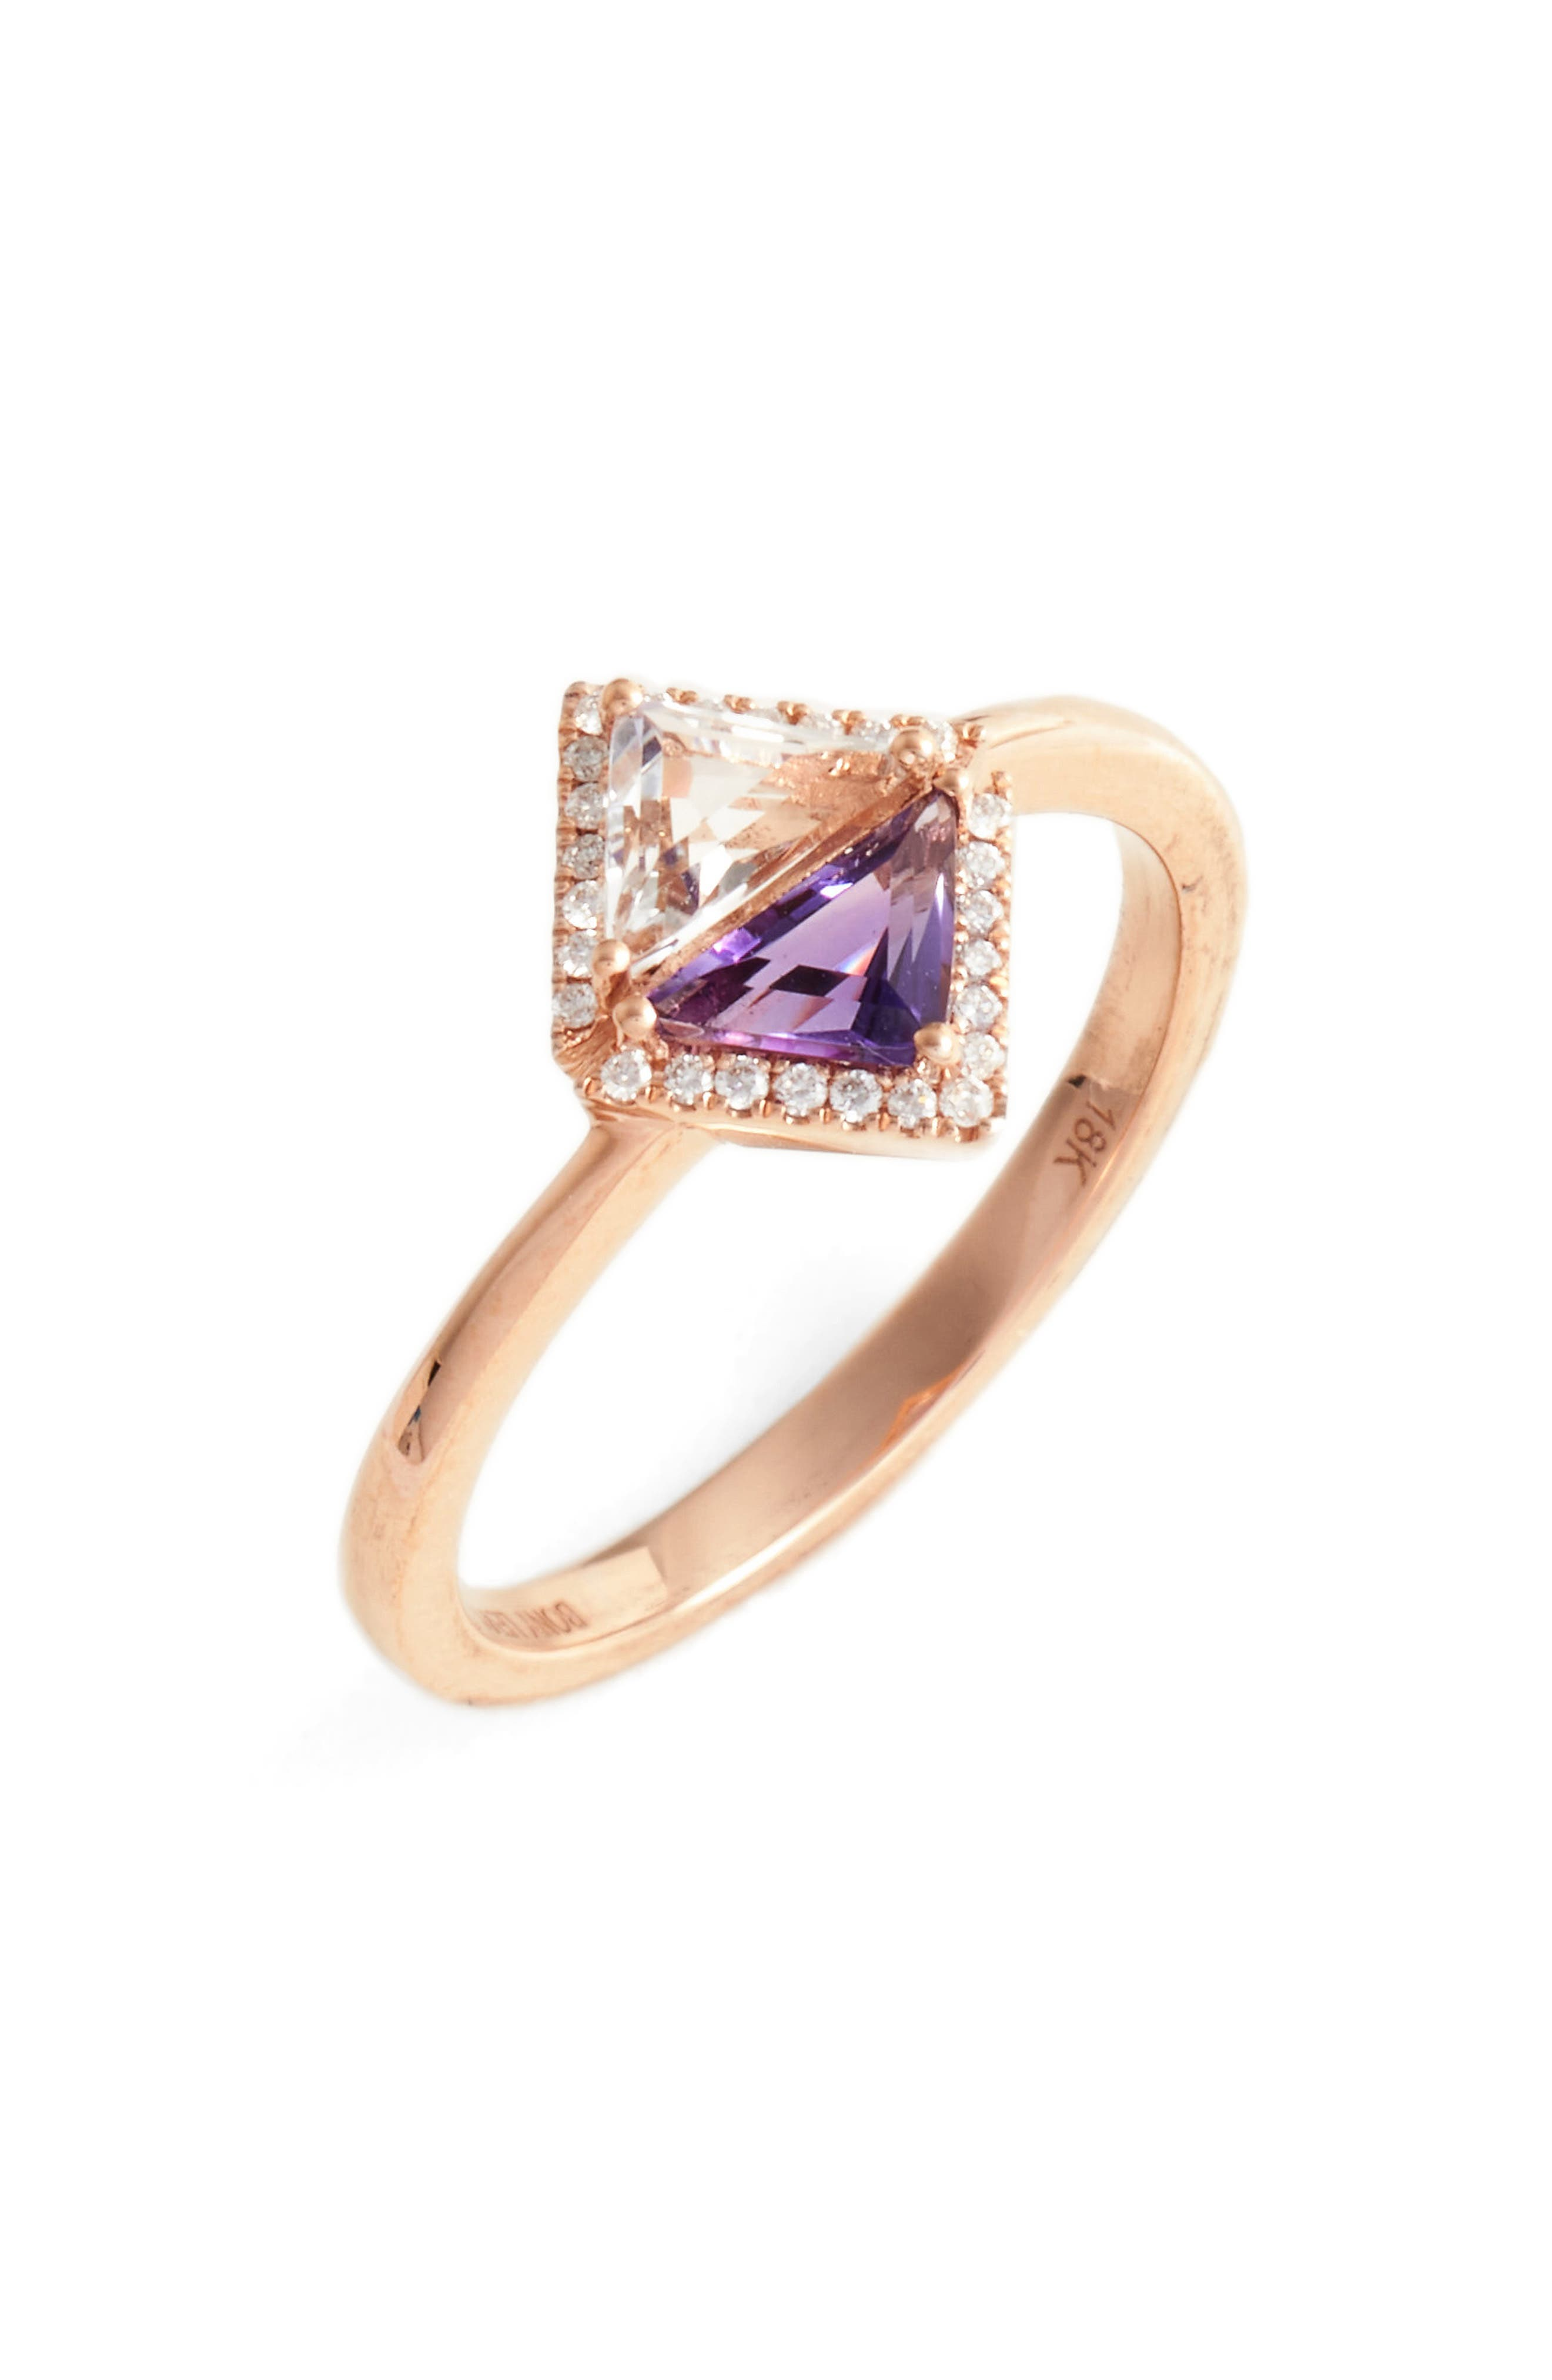 Iris Double Triangle Diamond & Semiprecious Stone Ring,                             Main thumbnail 1, color,                             White Topaz/ Amethyst